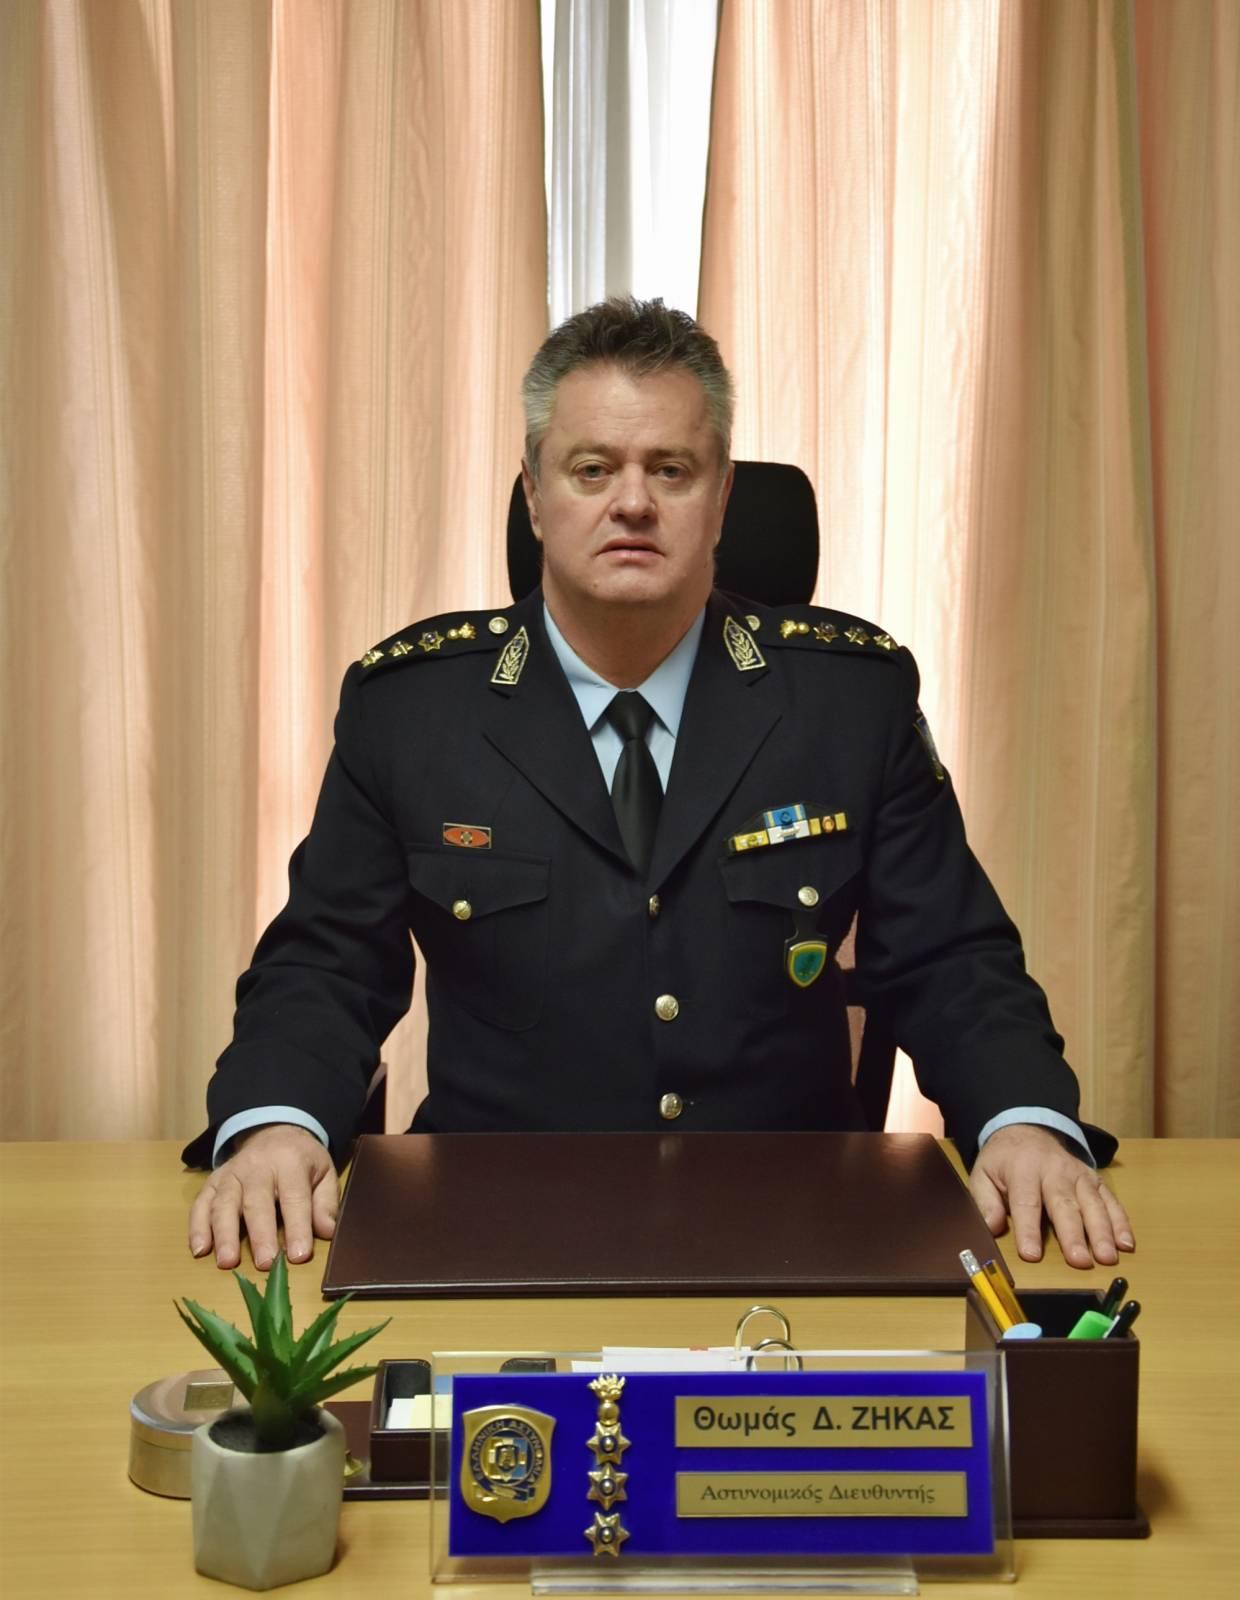 Aνέλαβε και εκτελεί καθήκοντα Διευθυντή της Διεύθυνσης Αστυνομίας Καστοριάς ο Αστυνομικός Διευθυντής Θωμάς Ζήκας